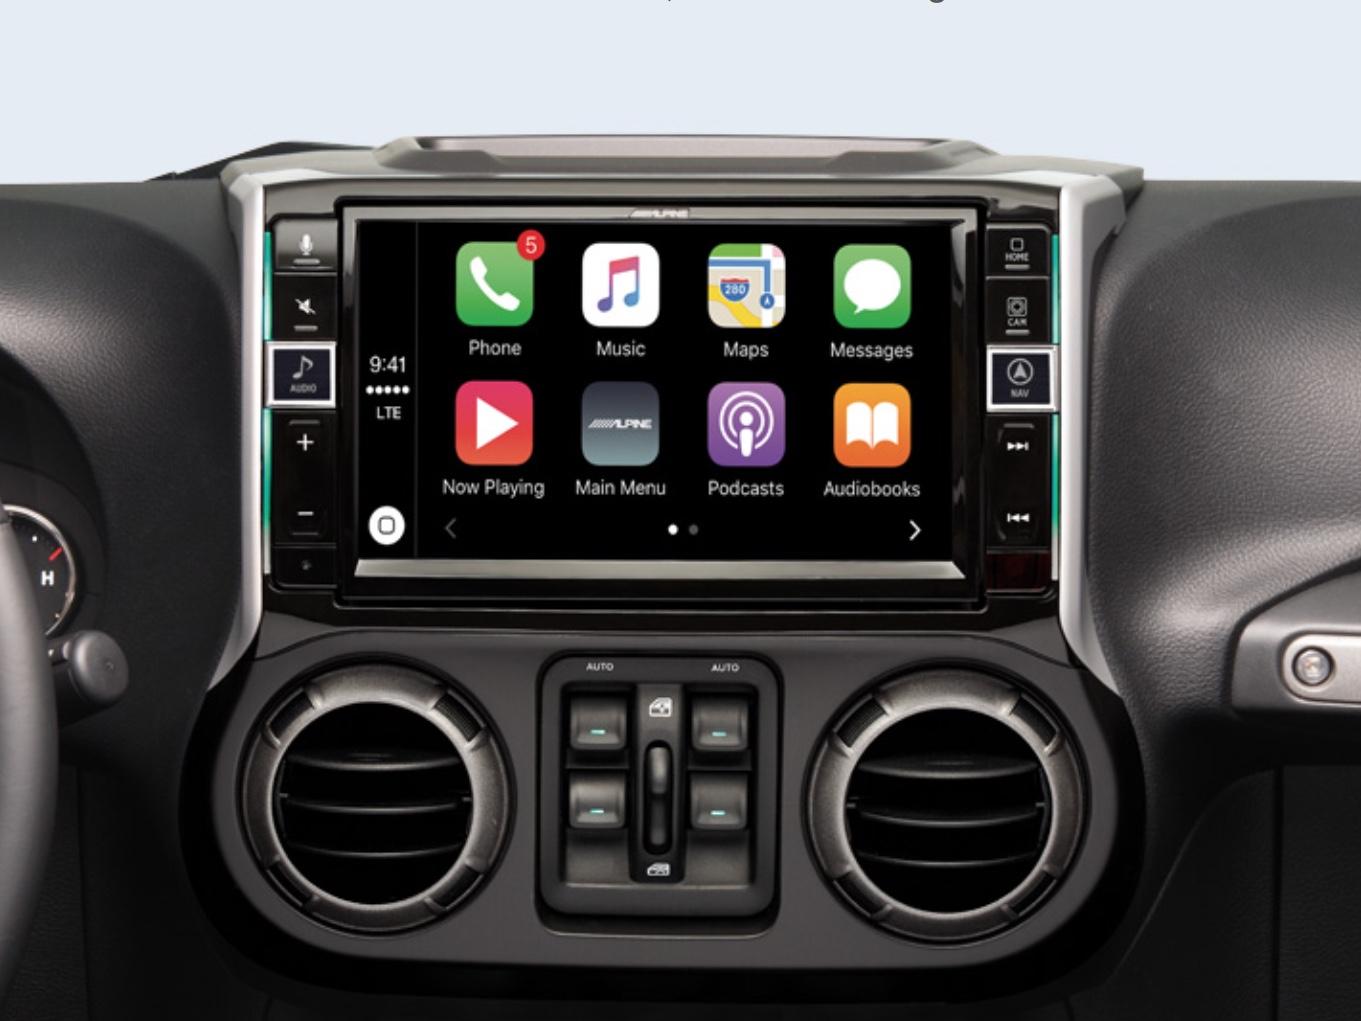 2013 Wrangler Fuse Box Alpine Introduces 9 Inch Carplay Unit For Newer Jeep